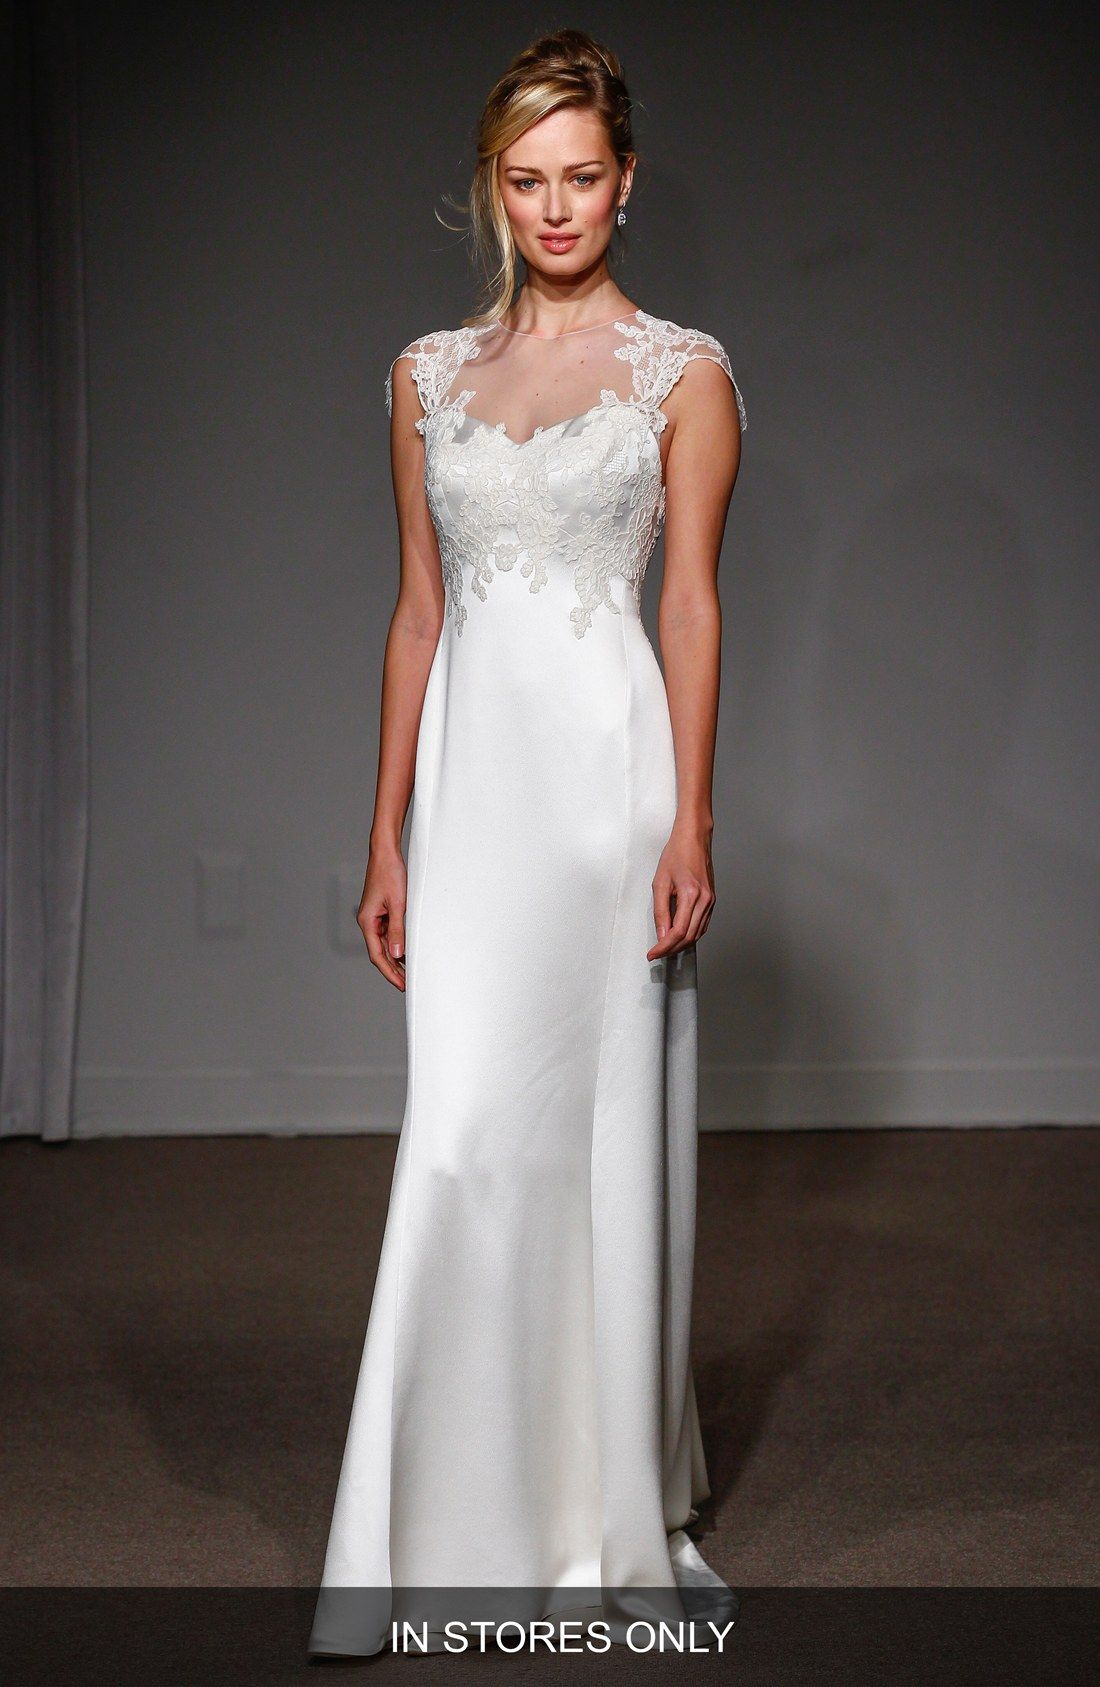 Silk sheath wedding dress  Pin by Mina Jolly on wed d xtr  Pinterest  Illusions Anna and